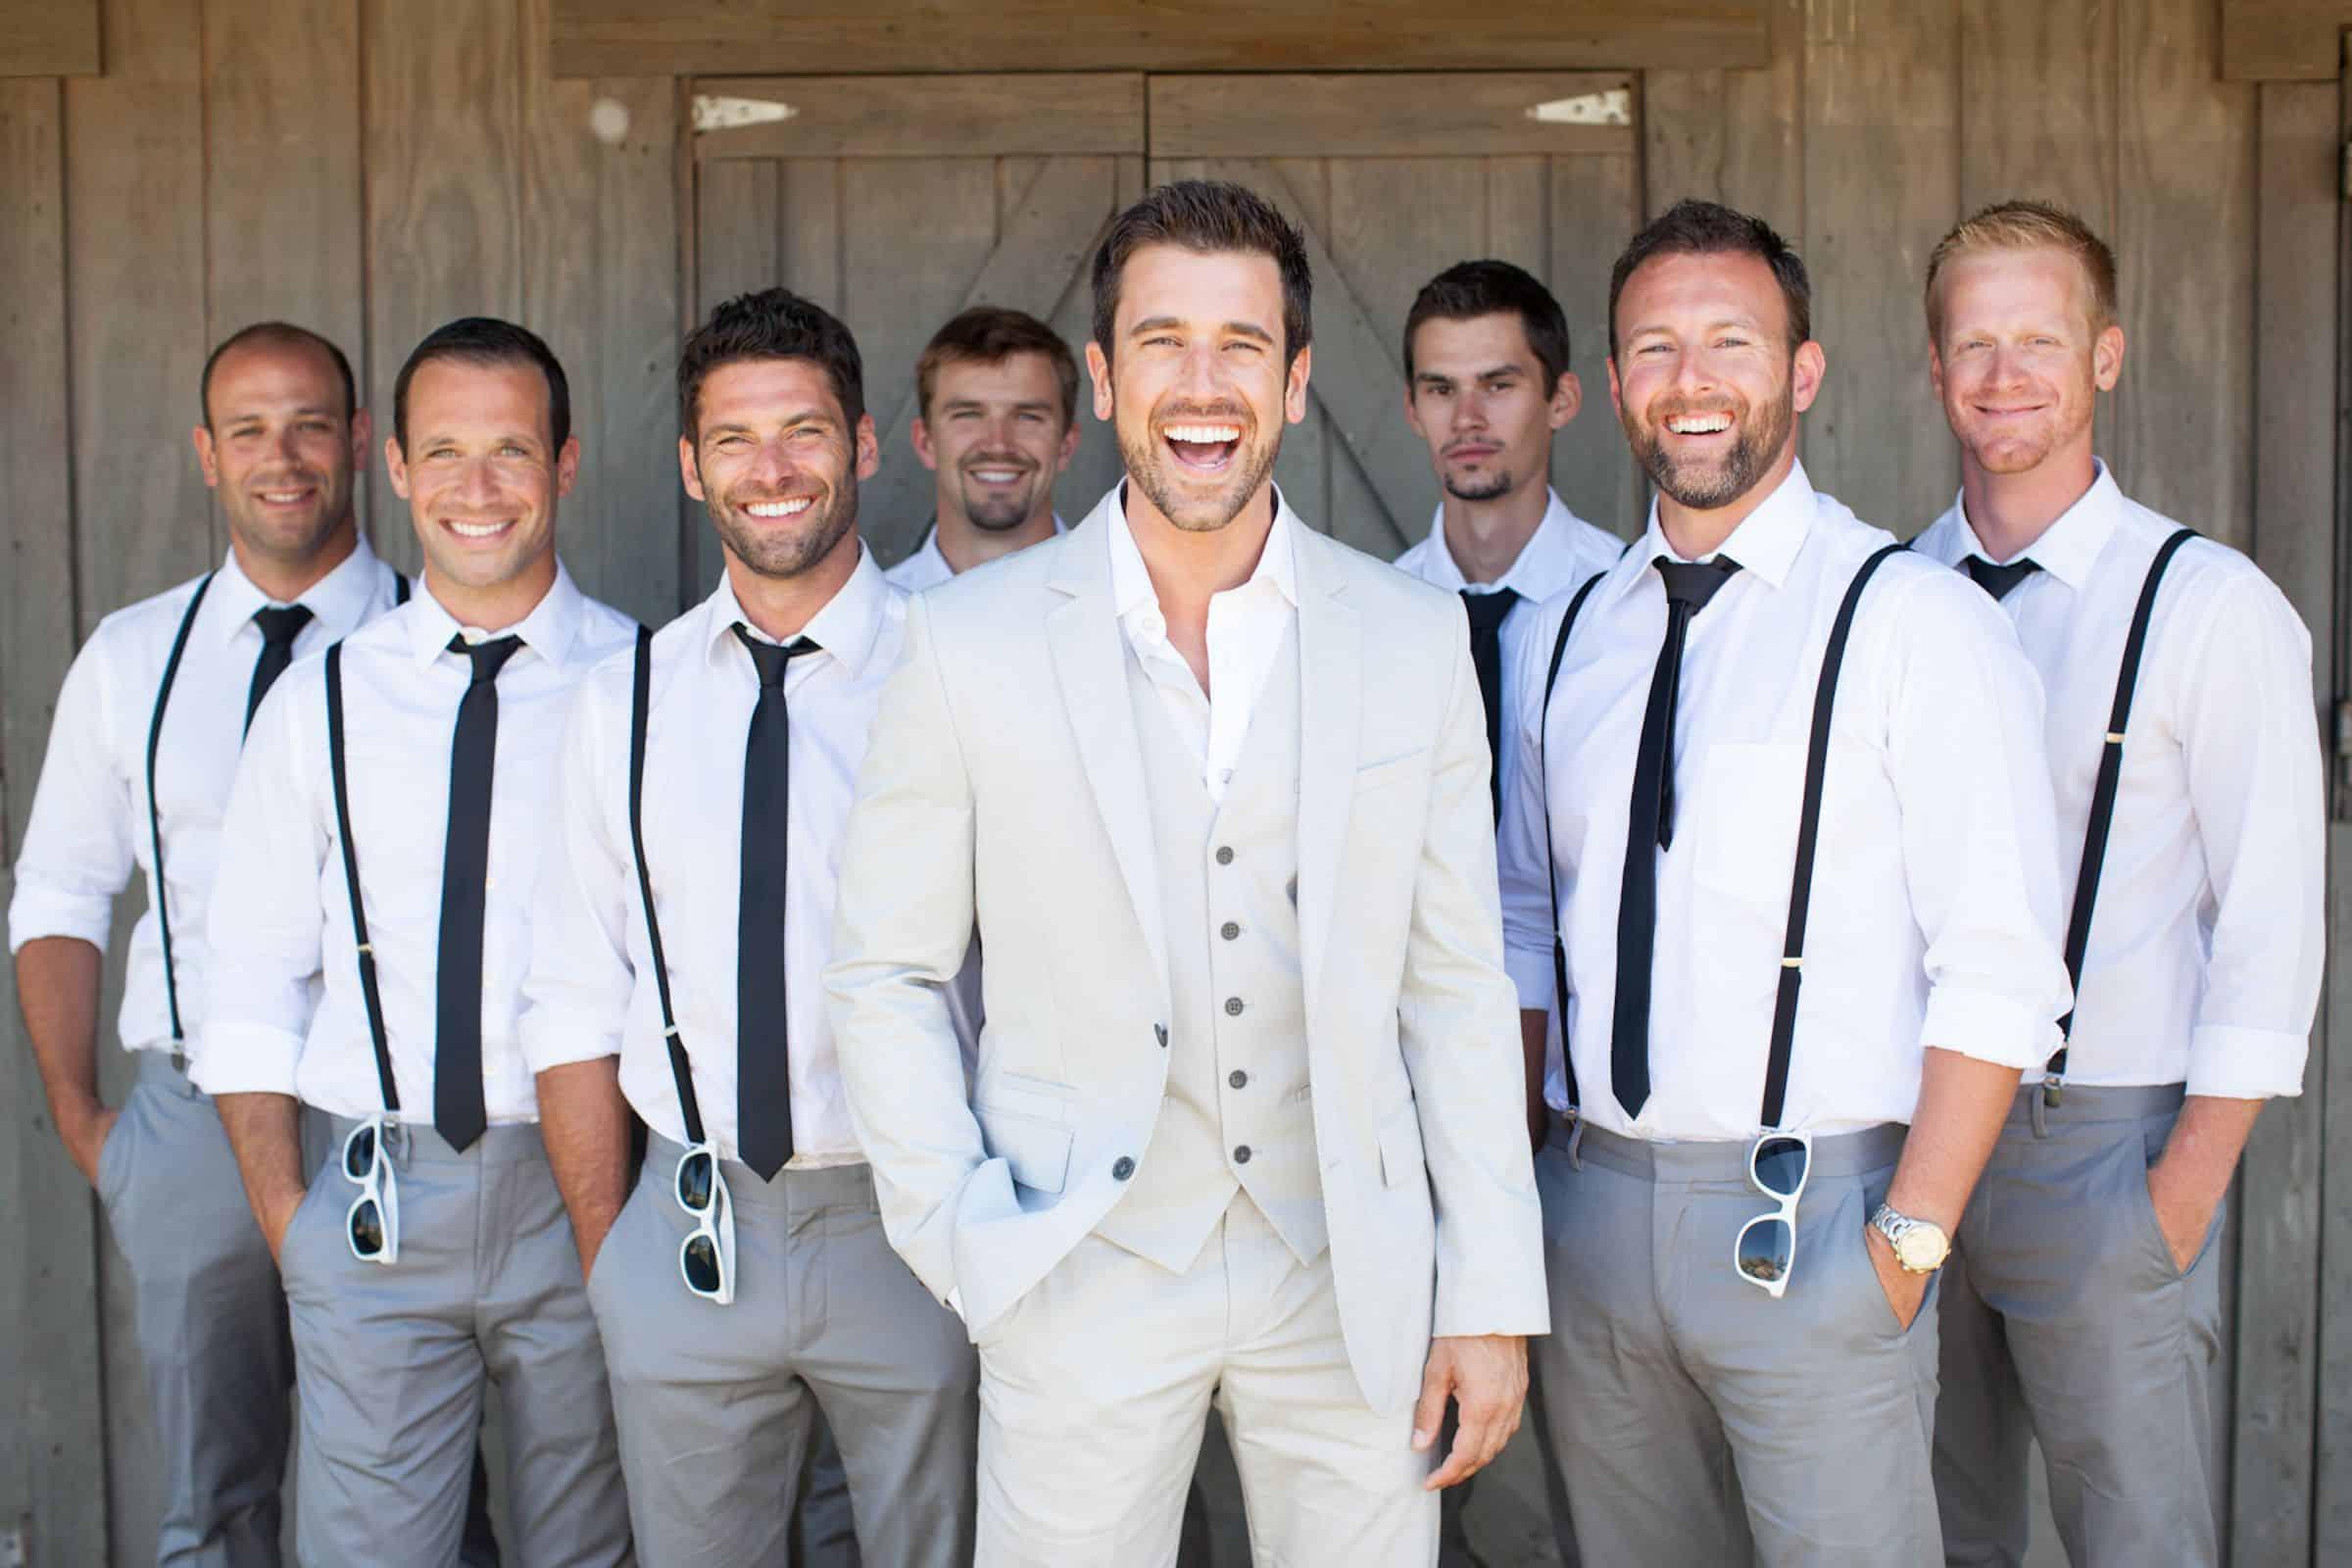 groom and the wedding groomsmen wearing the same suit